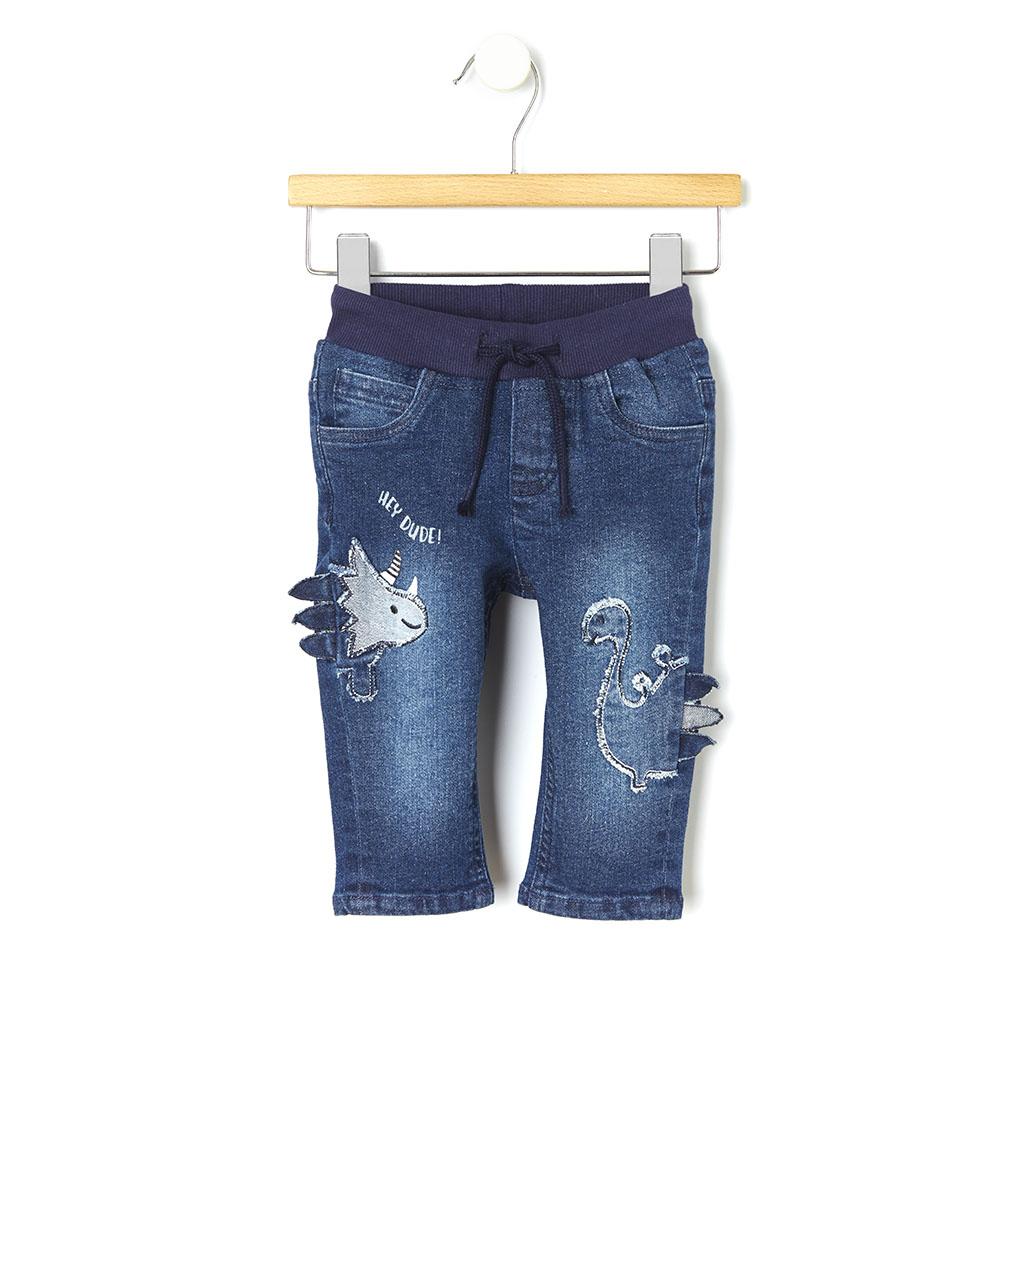 Pantalone denim con patch dinosauri - Prénatal